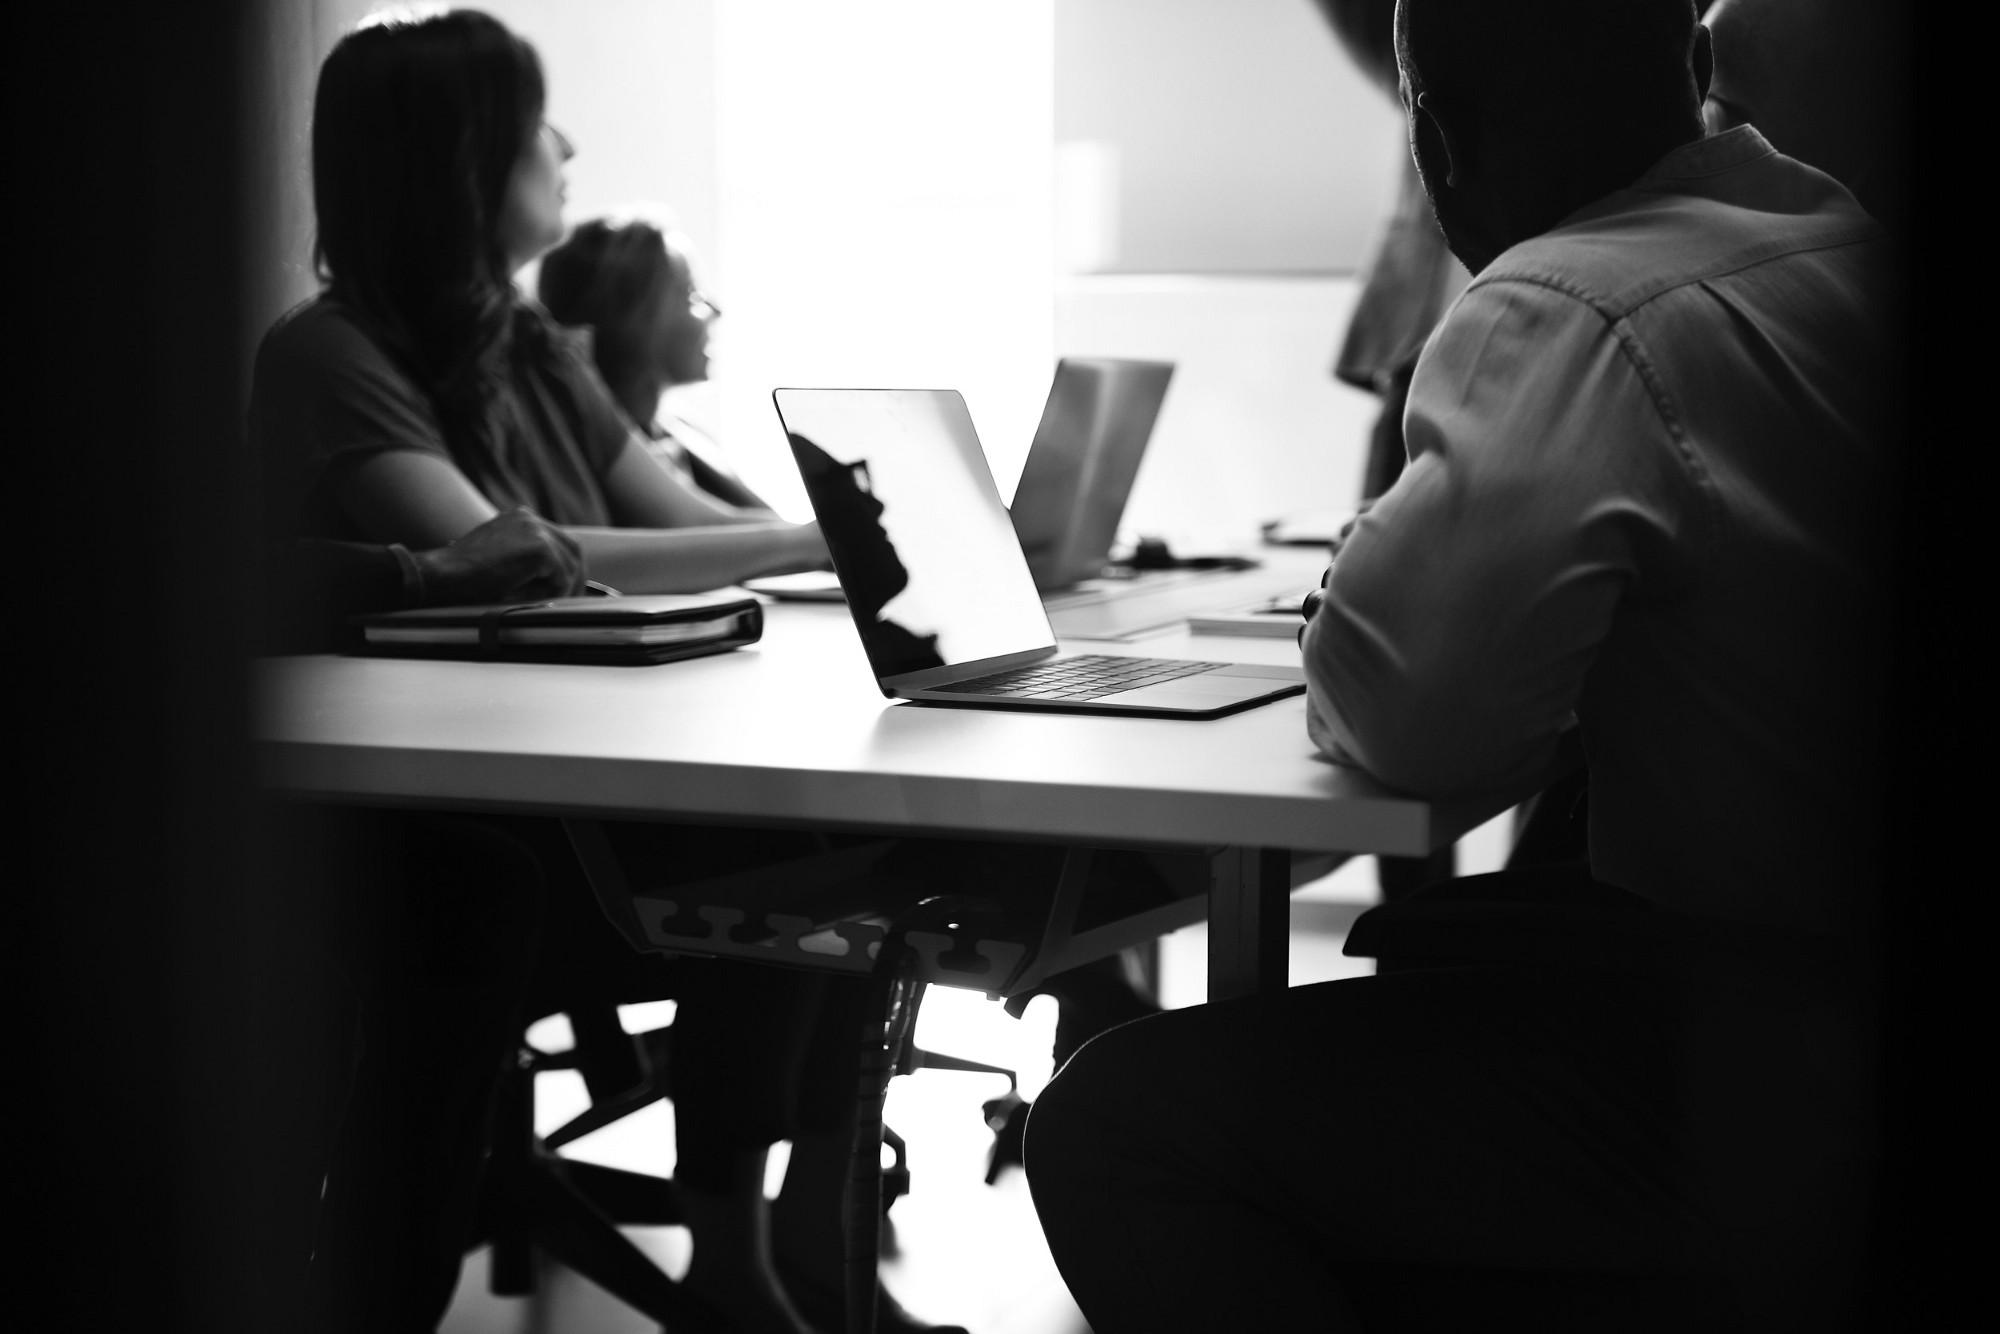 Team working on agile sprint retrospective at desk